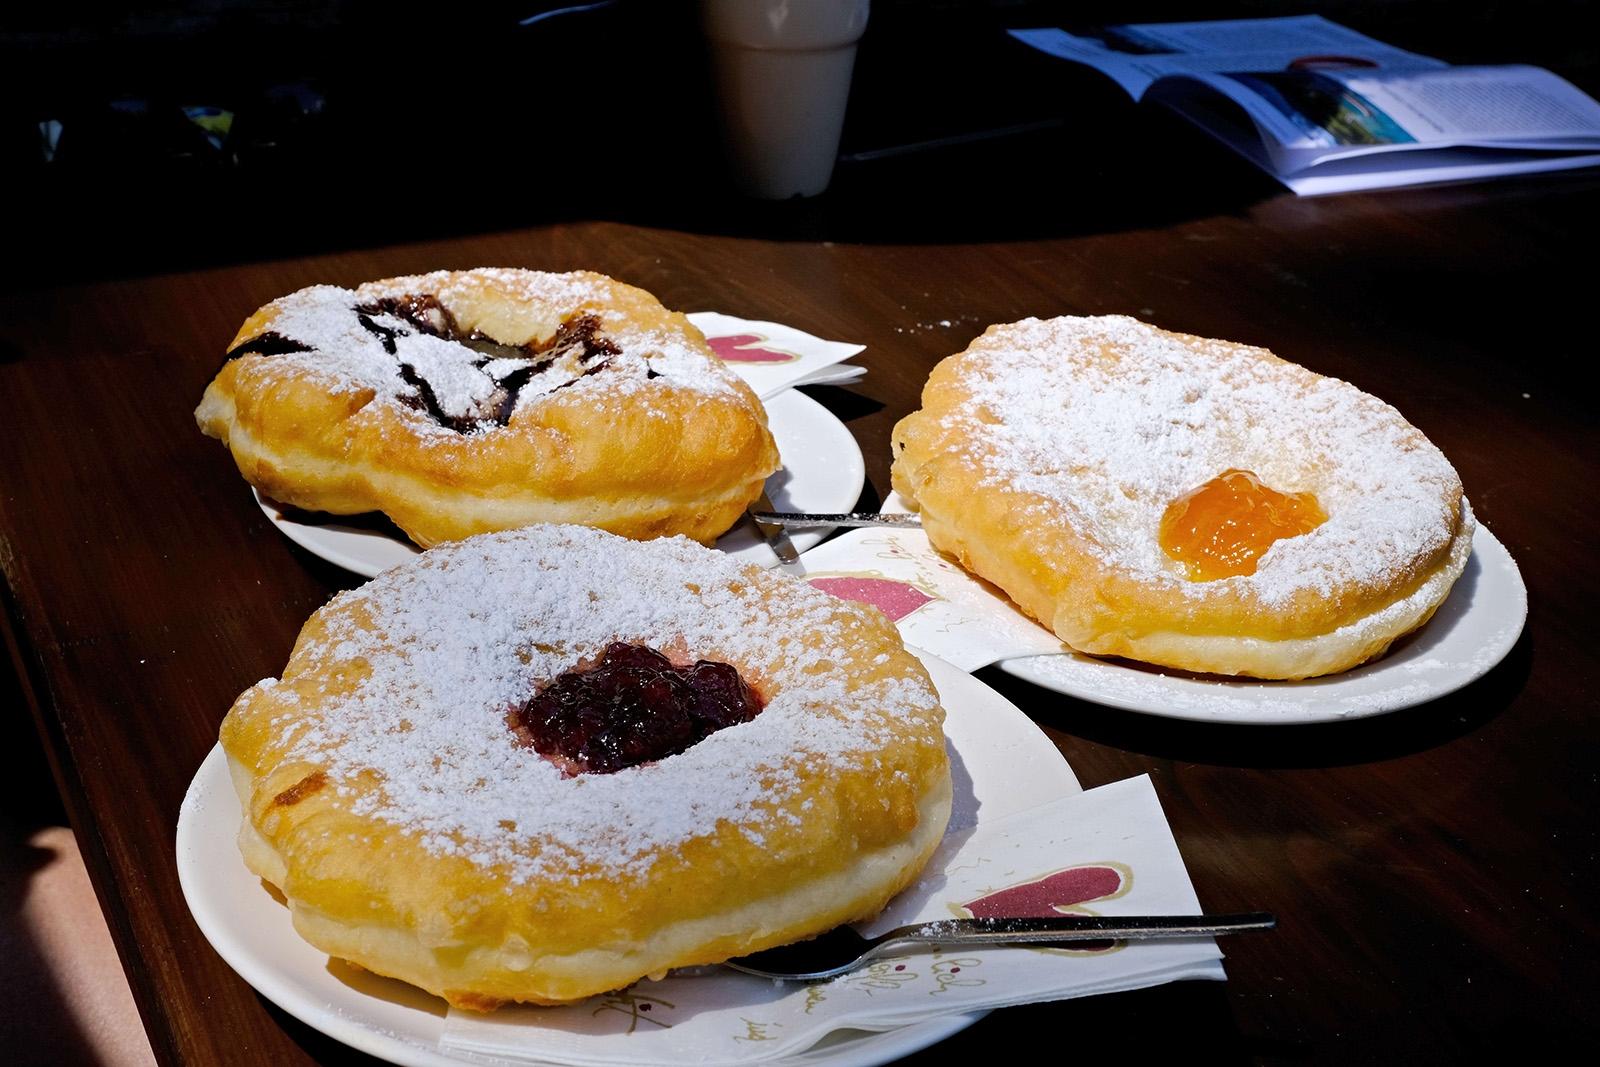 Placaté koblihy tzv. Krapfen na sladko podle s brusinkovým a meruňkovým džemem podle  rodinné receptury